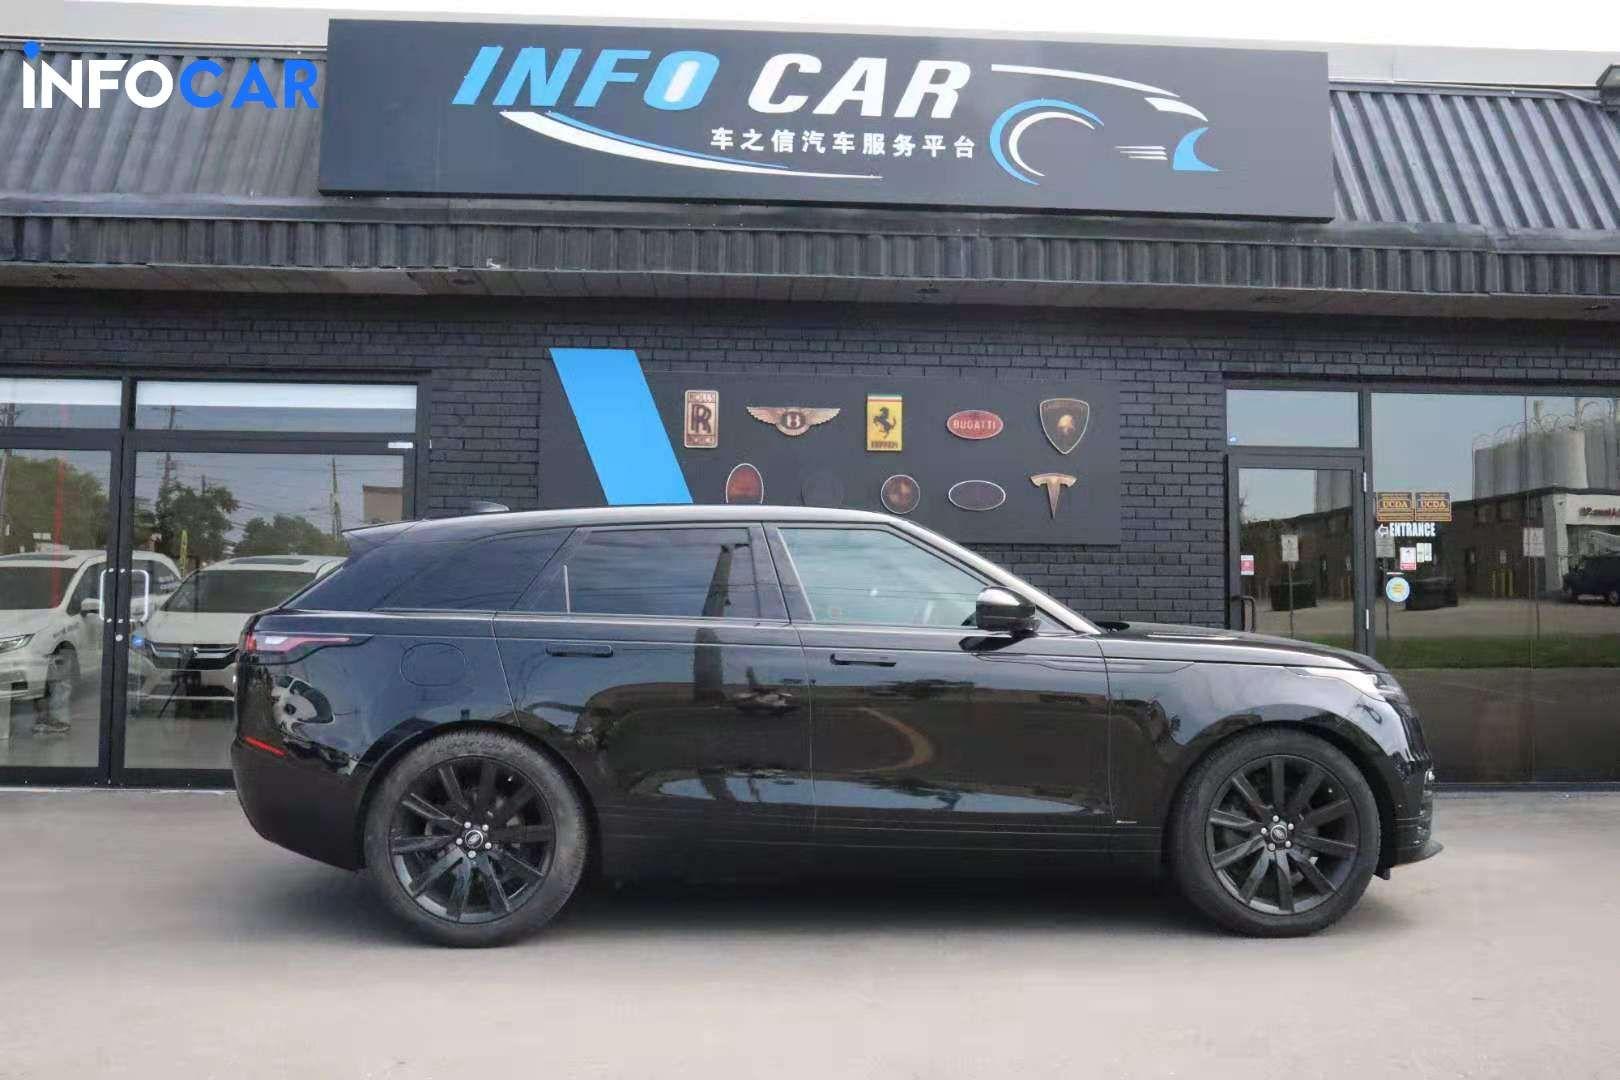 2019 Land Rover Range Rover Velar p380 - INFOCAR - Toronto's Most Comprehensive New and Used Auto Trading Platform